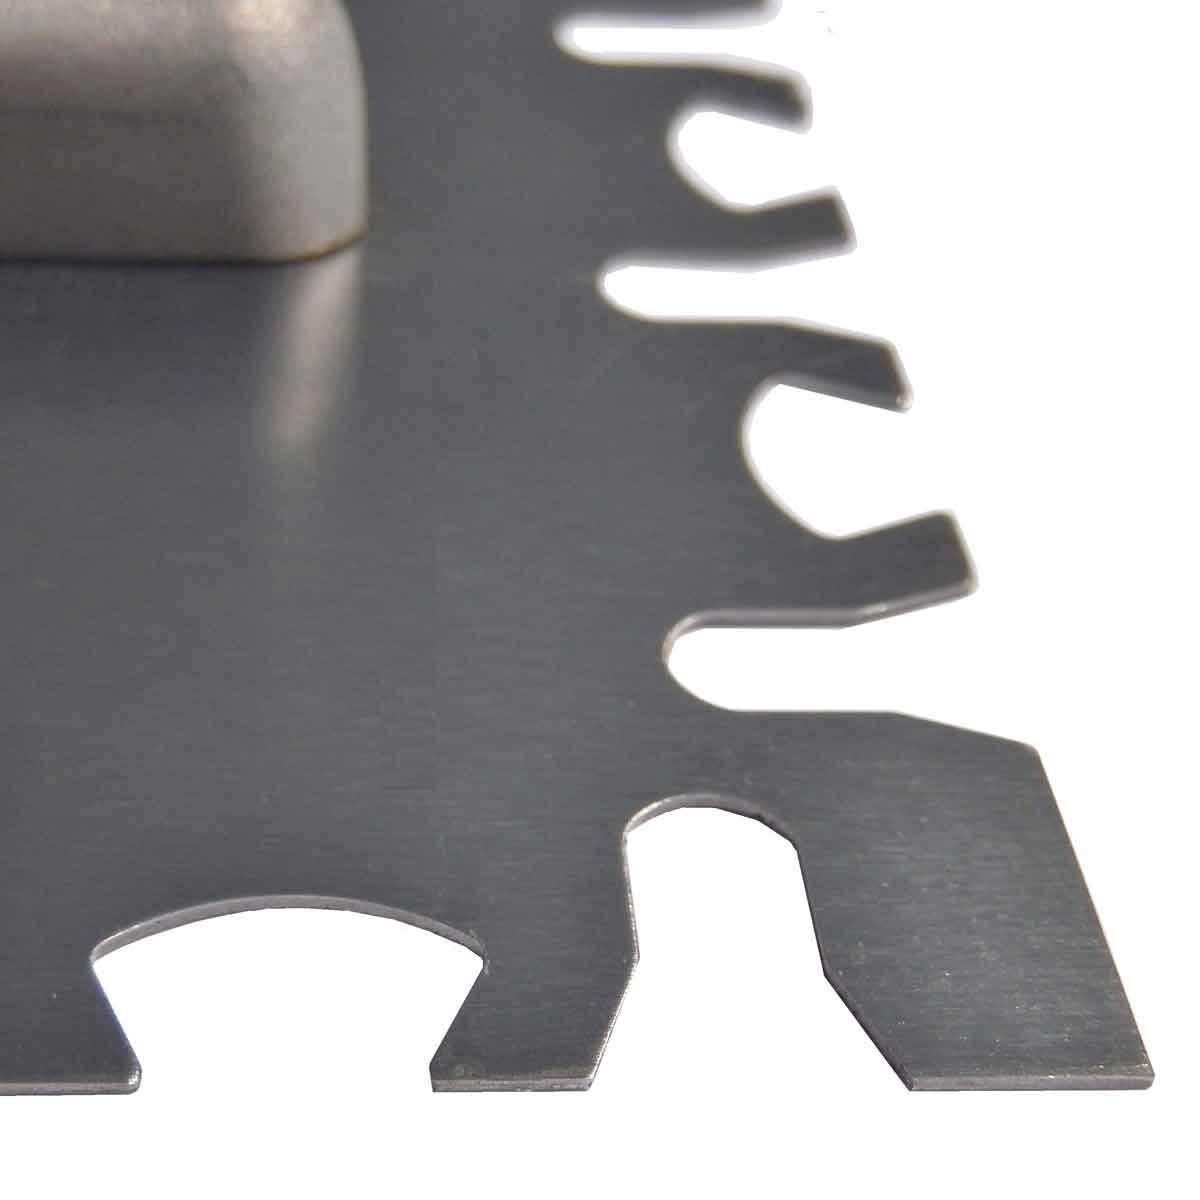 Ultragrip Euro Notch tile Trowel